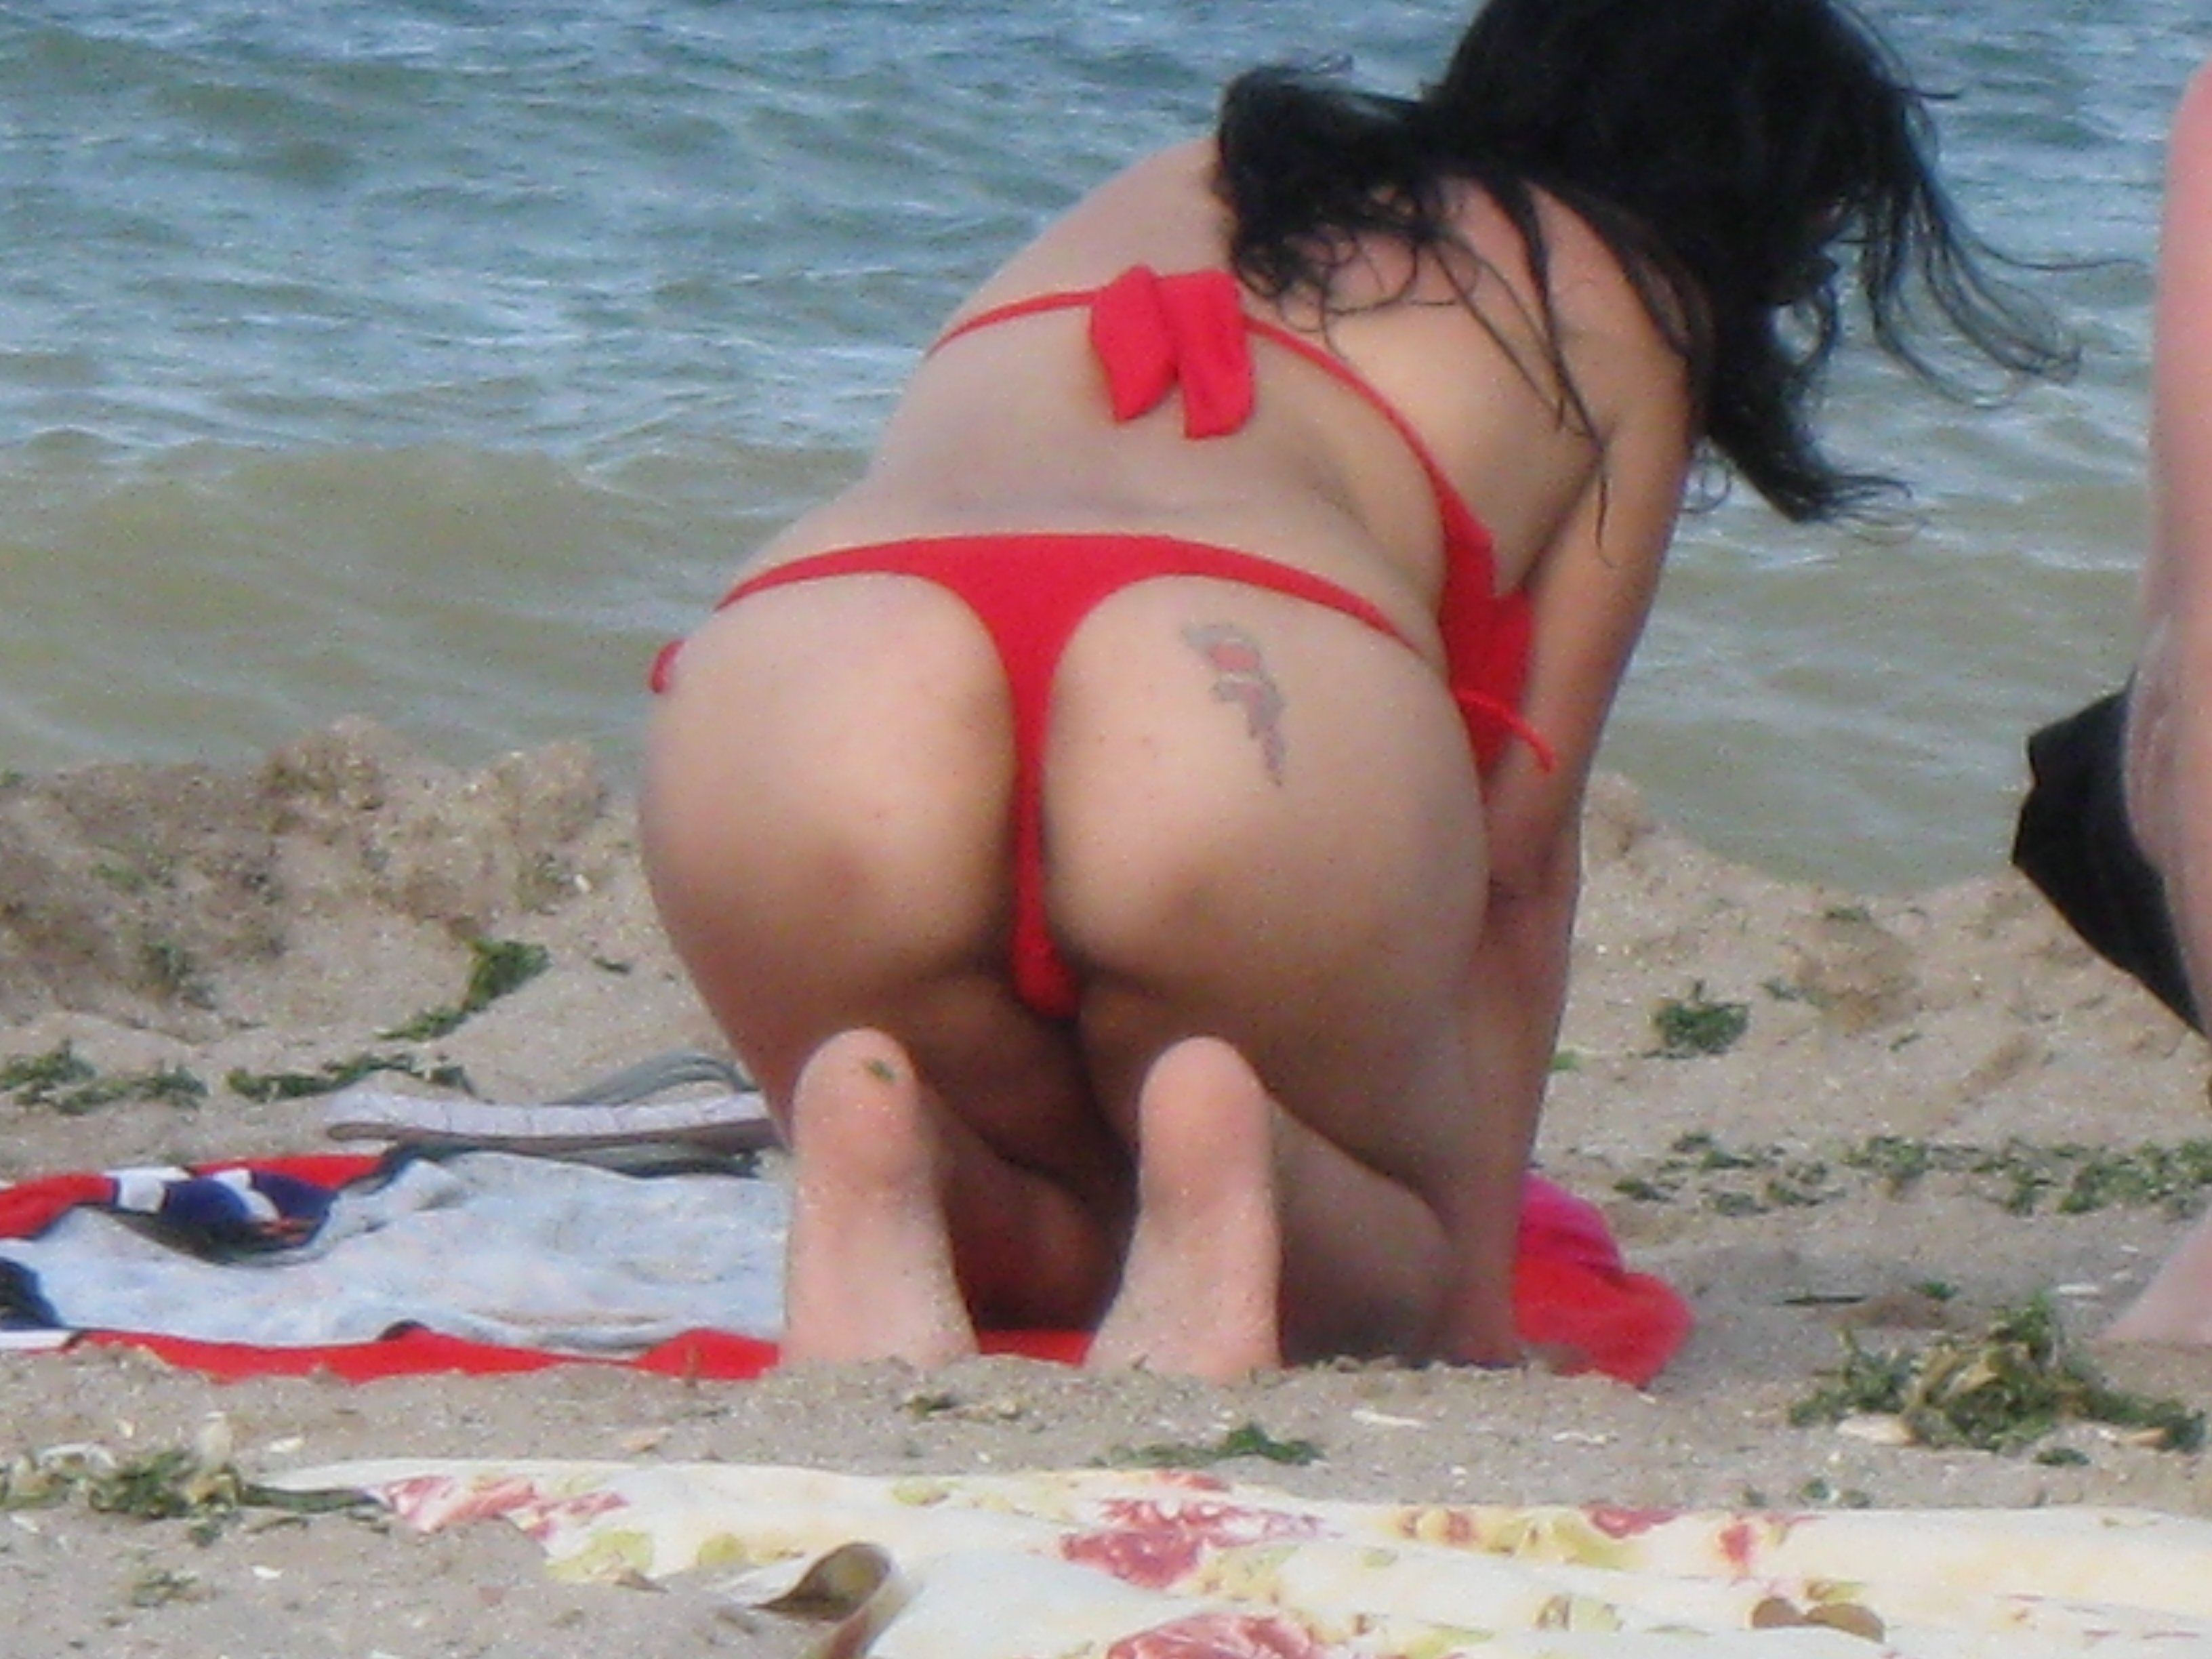 These bikini thongs draw attention to her nice tattooed ass